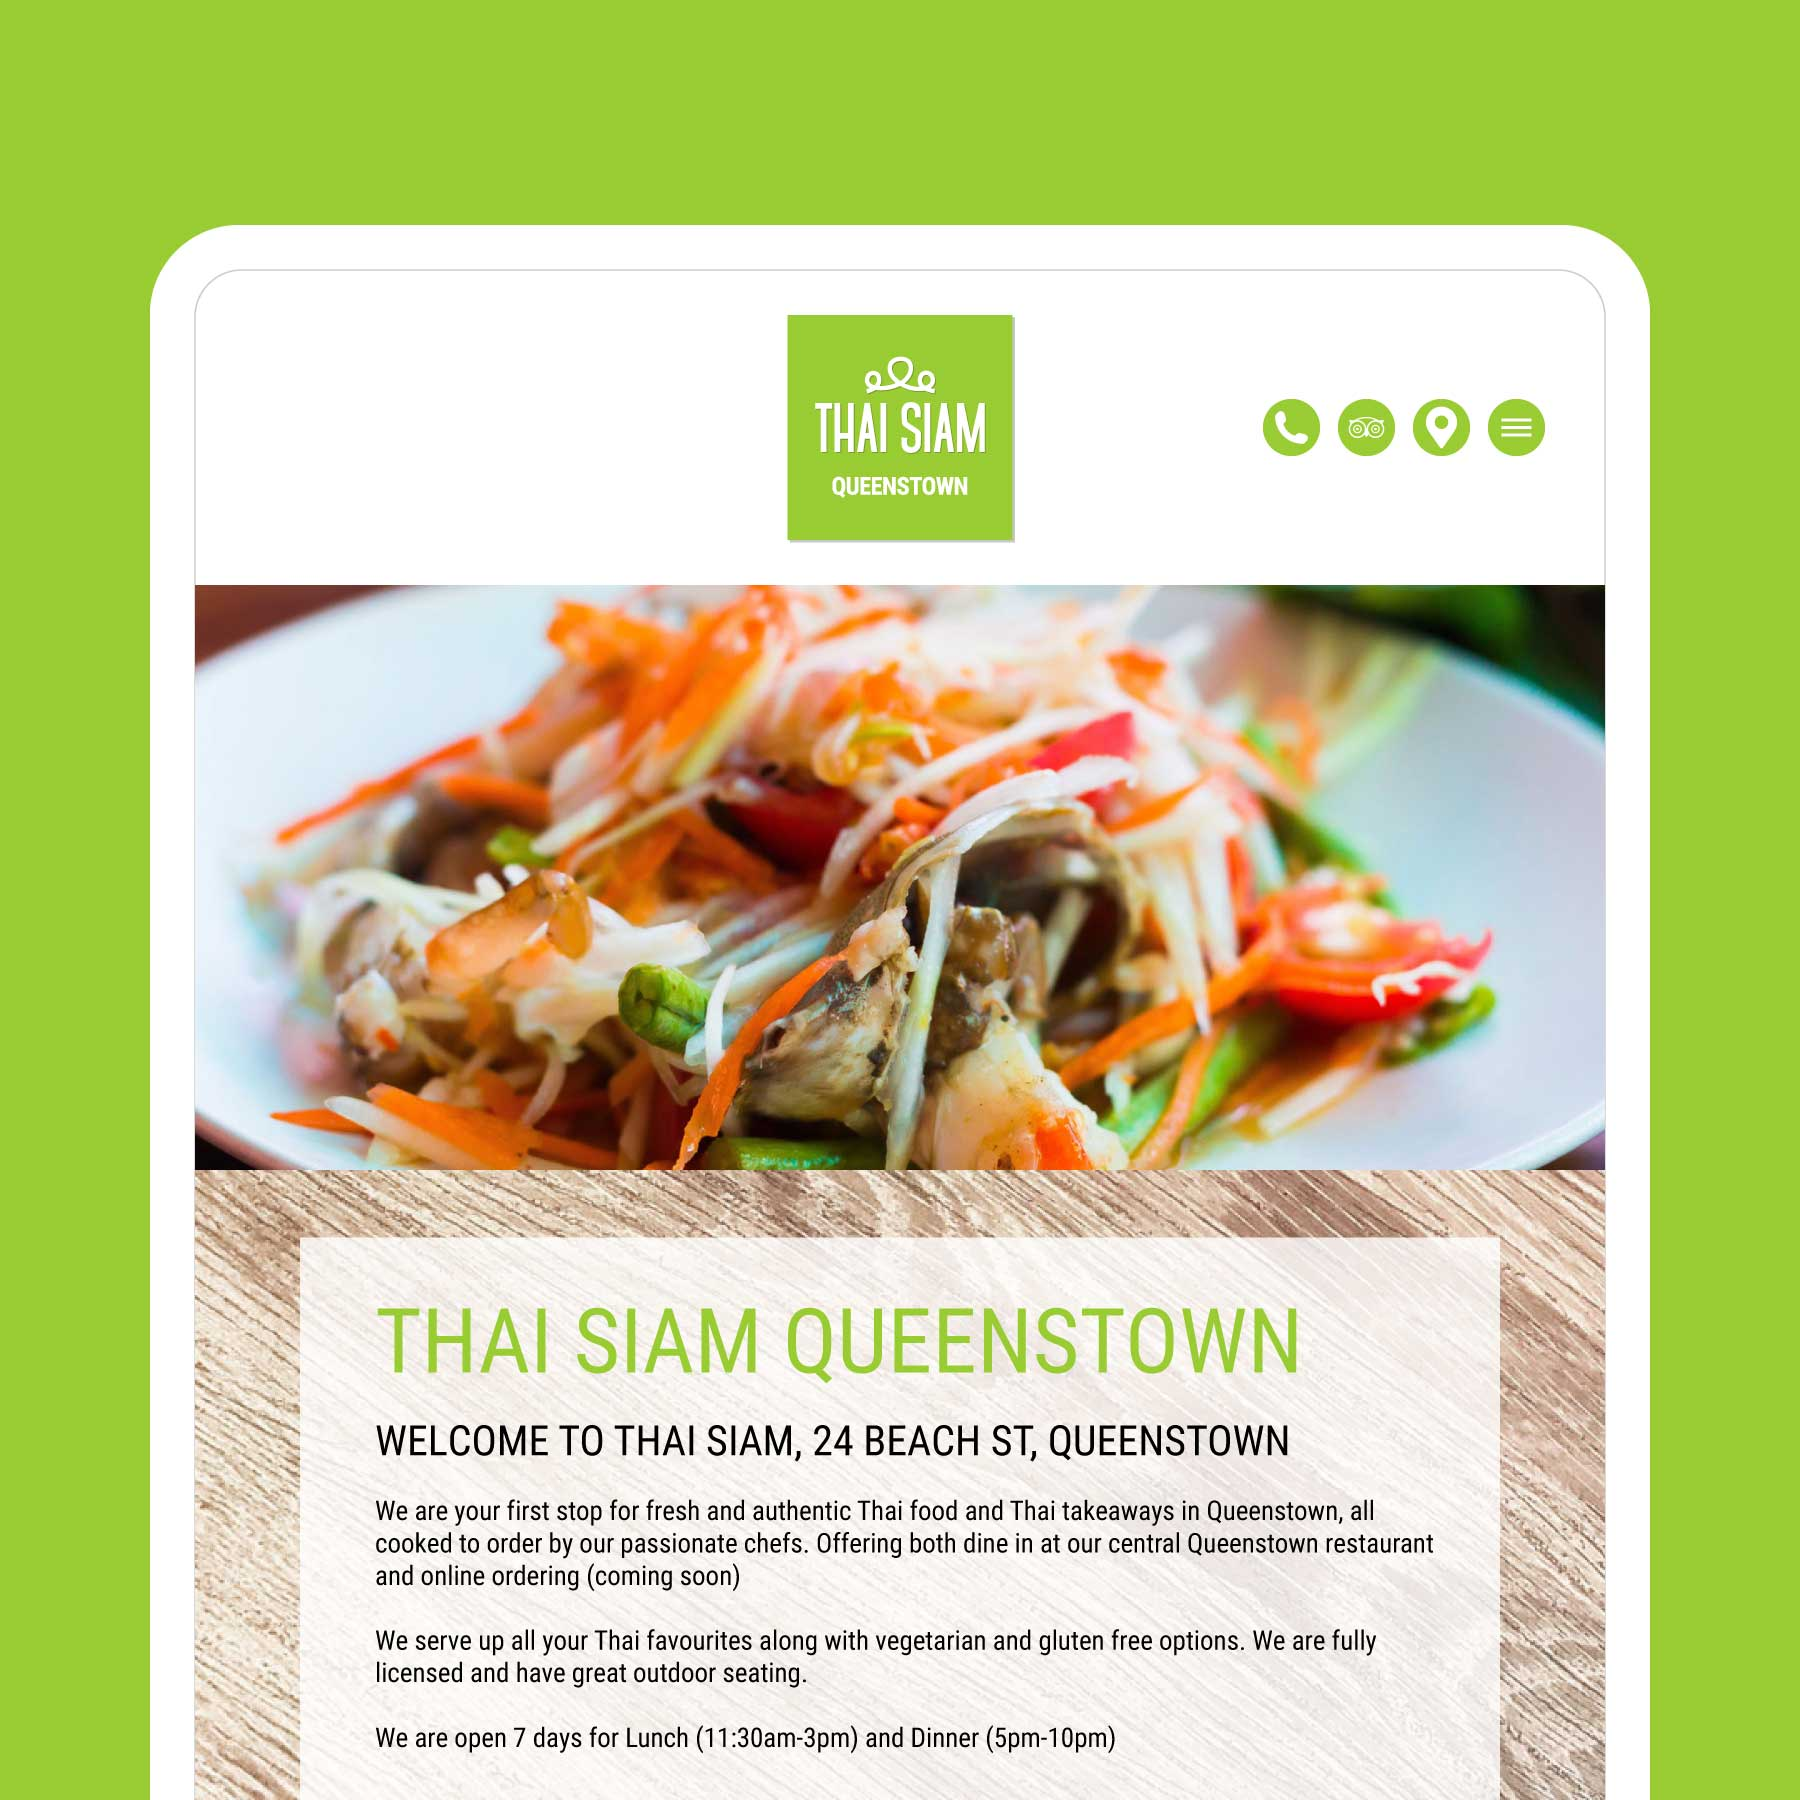 Thai Siam Queenstown Web Design